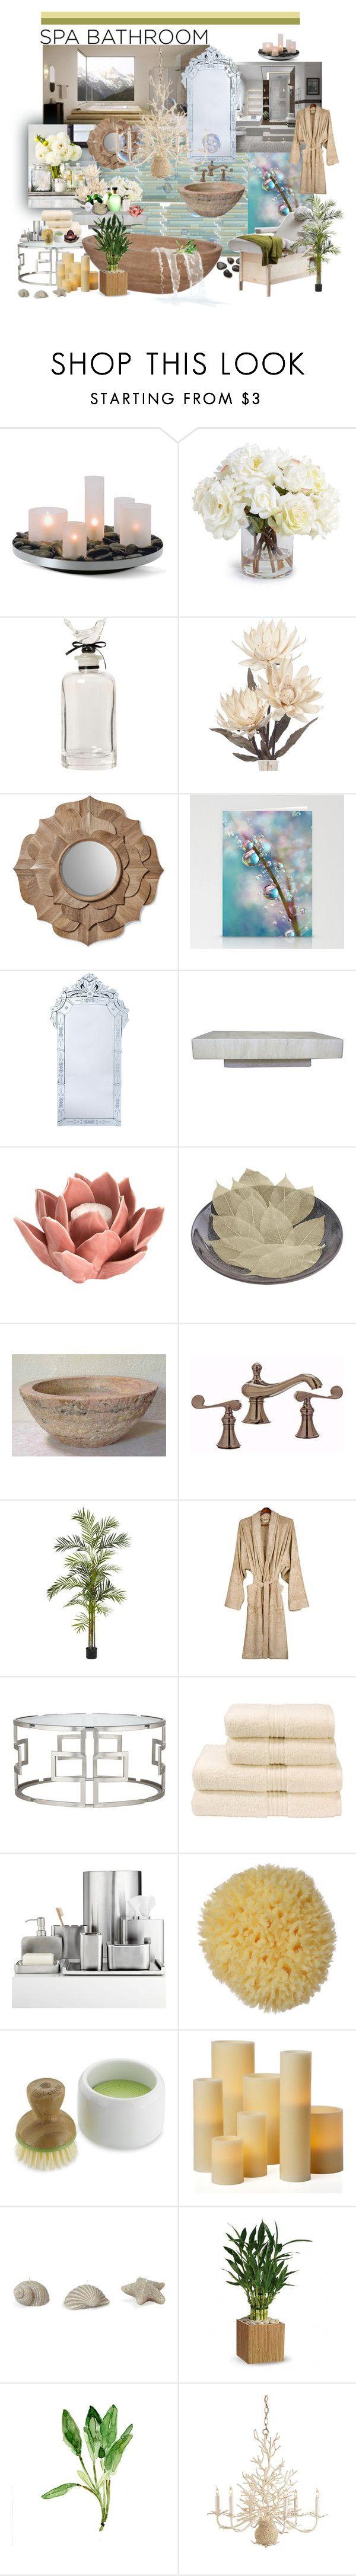 7 best LED Strip Light Ideas images on Pinterest